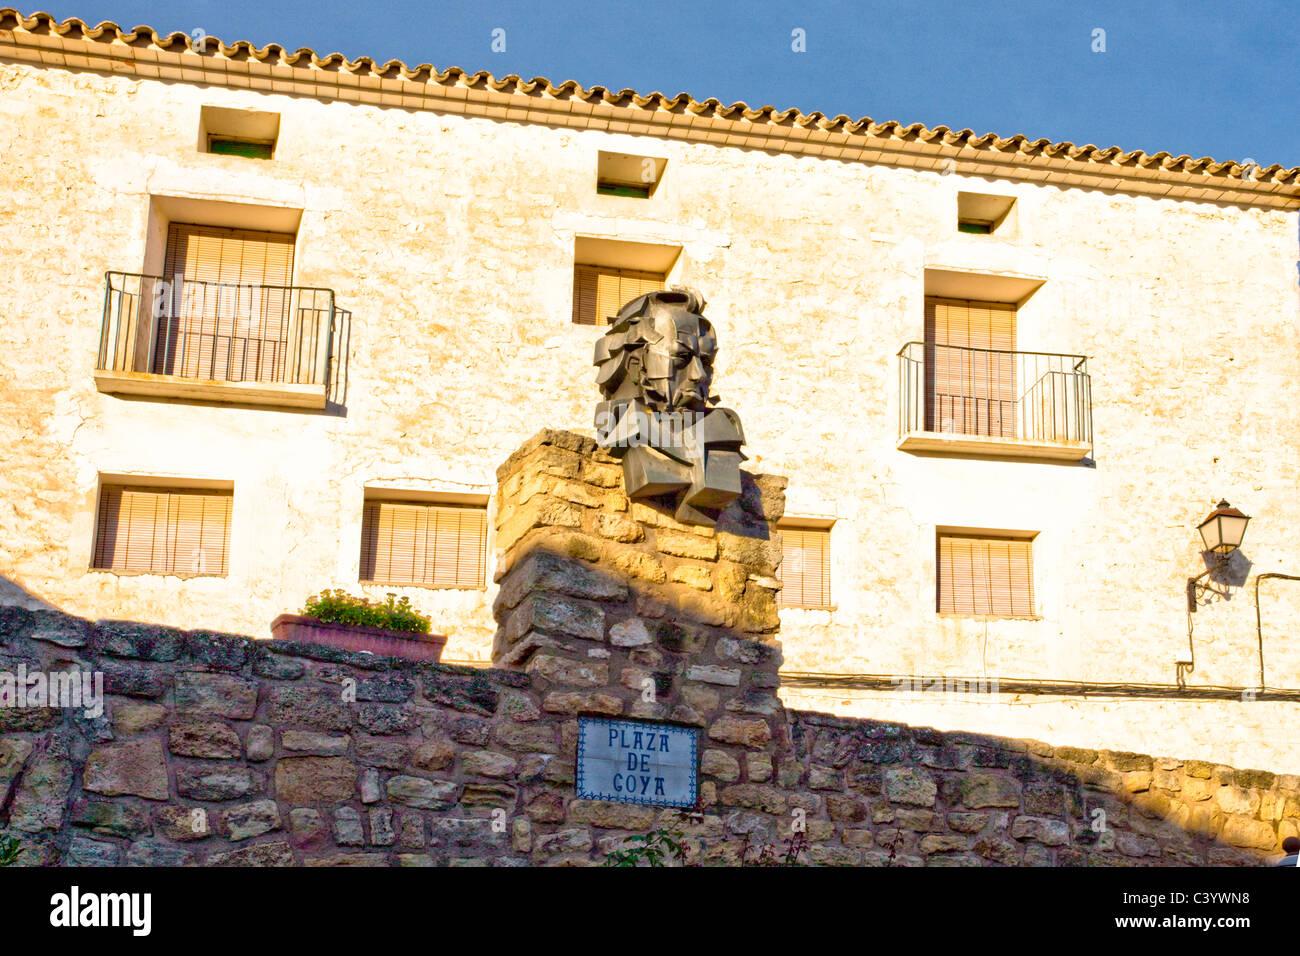 L'Espagne, l'Europe, Aragon, Fuendetodos, Goya, plastique, Photo Stock